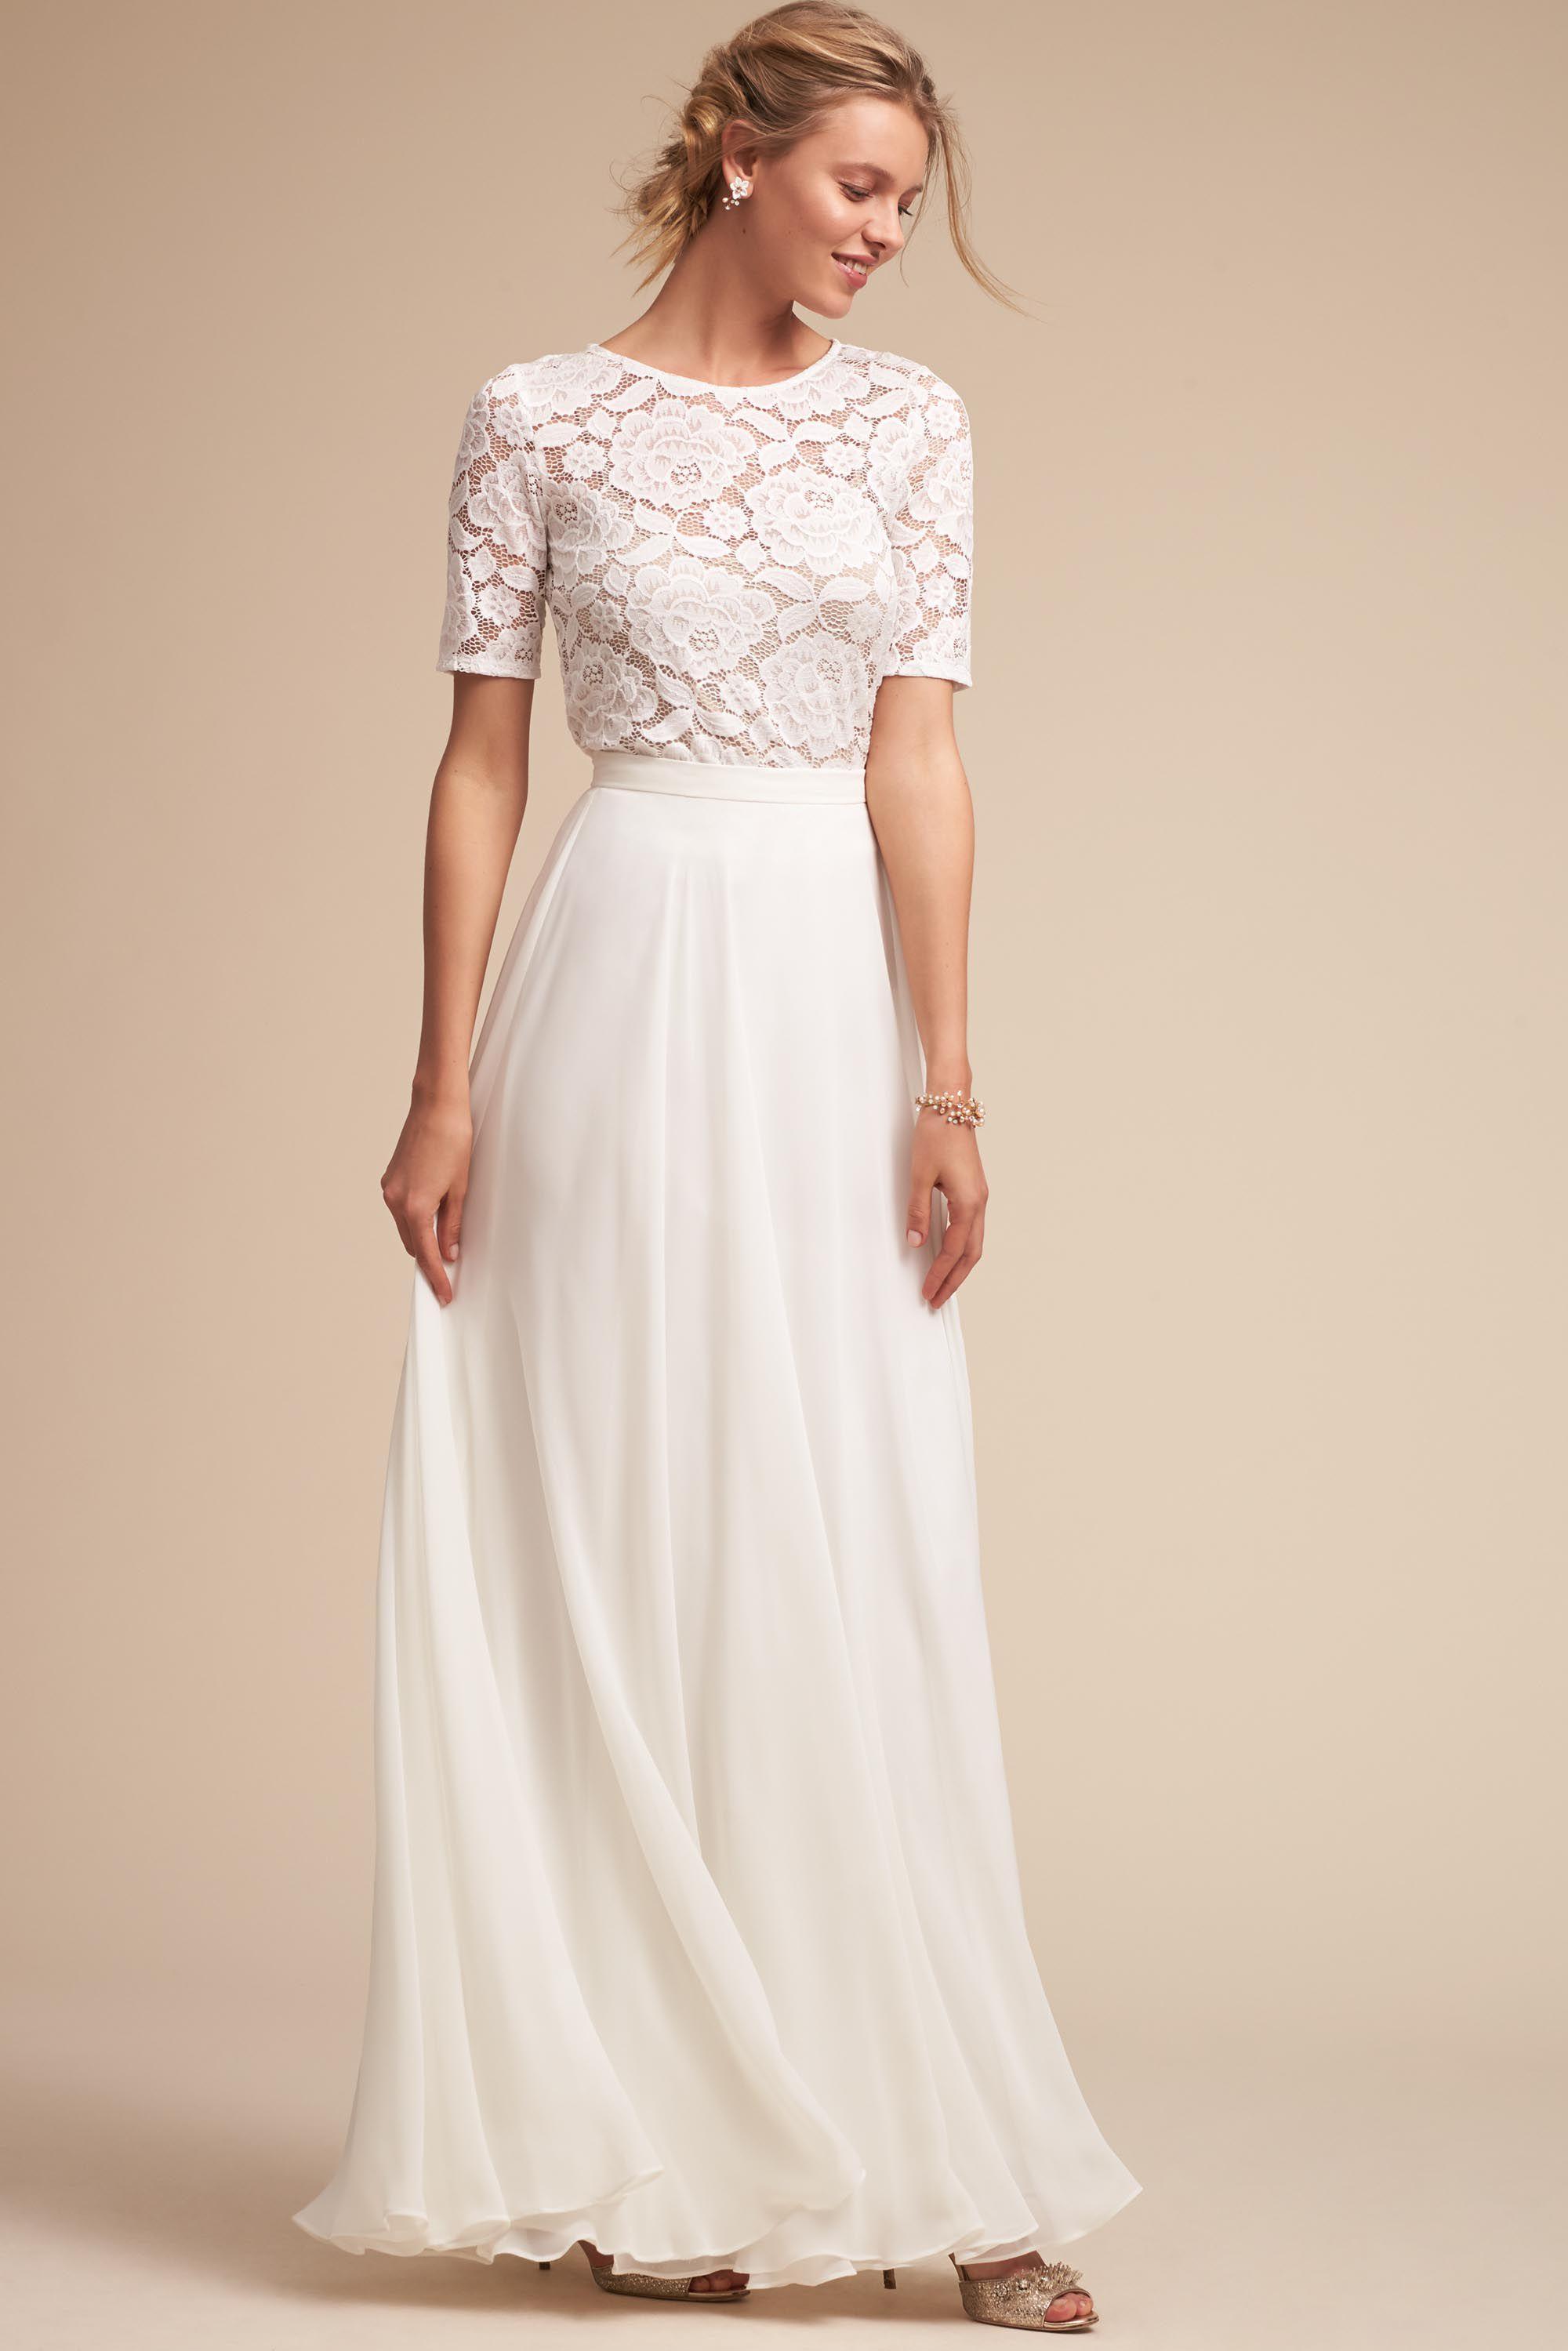 Jive Top Amp Hampton Skirt In Bridesmaids Amp Bridal Party BHLDN